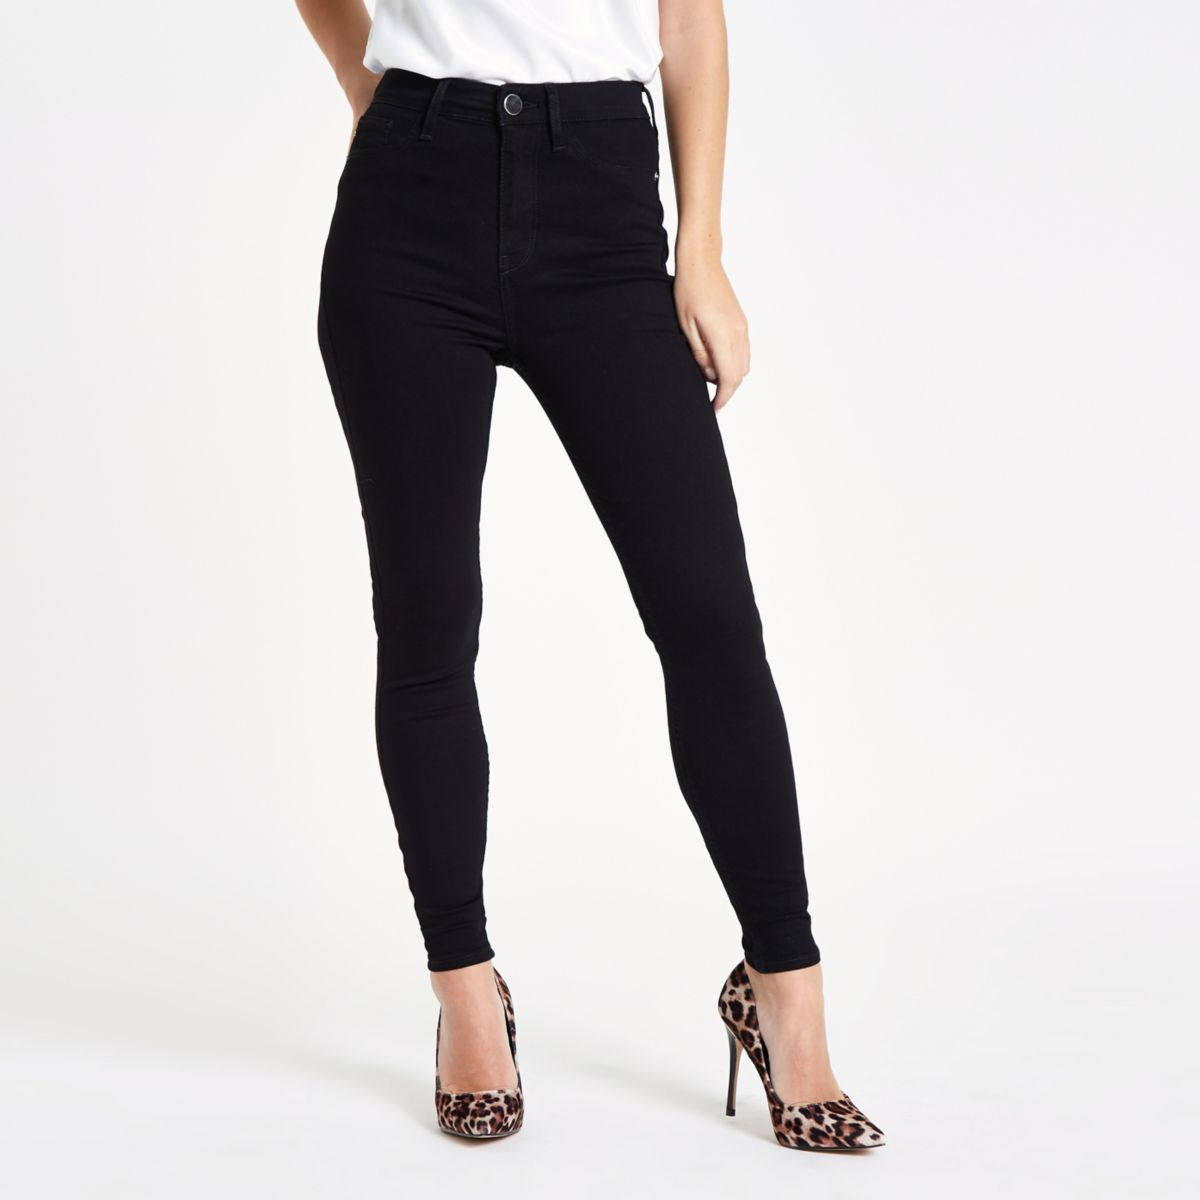 Petite black Harper high rise skinny jeans